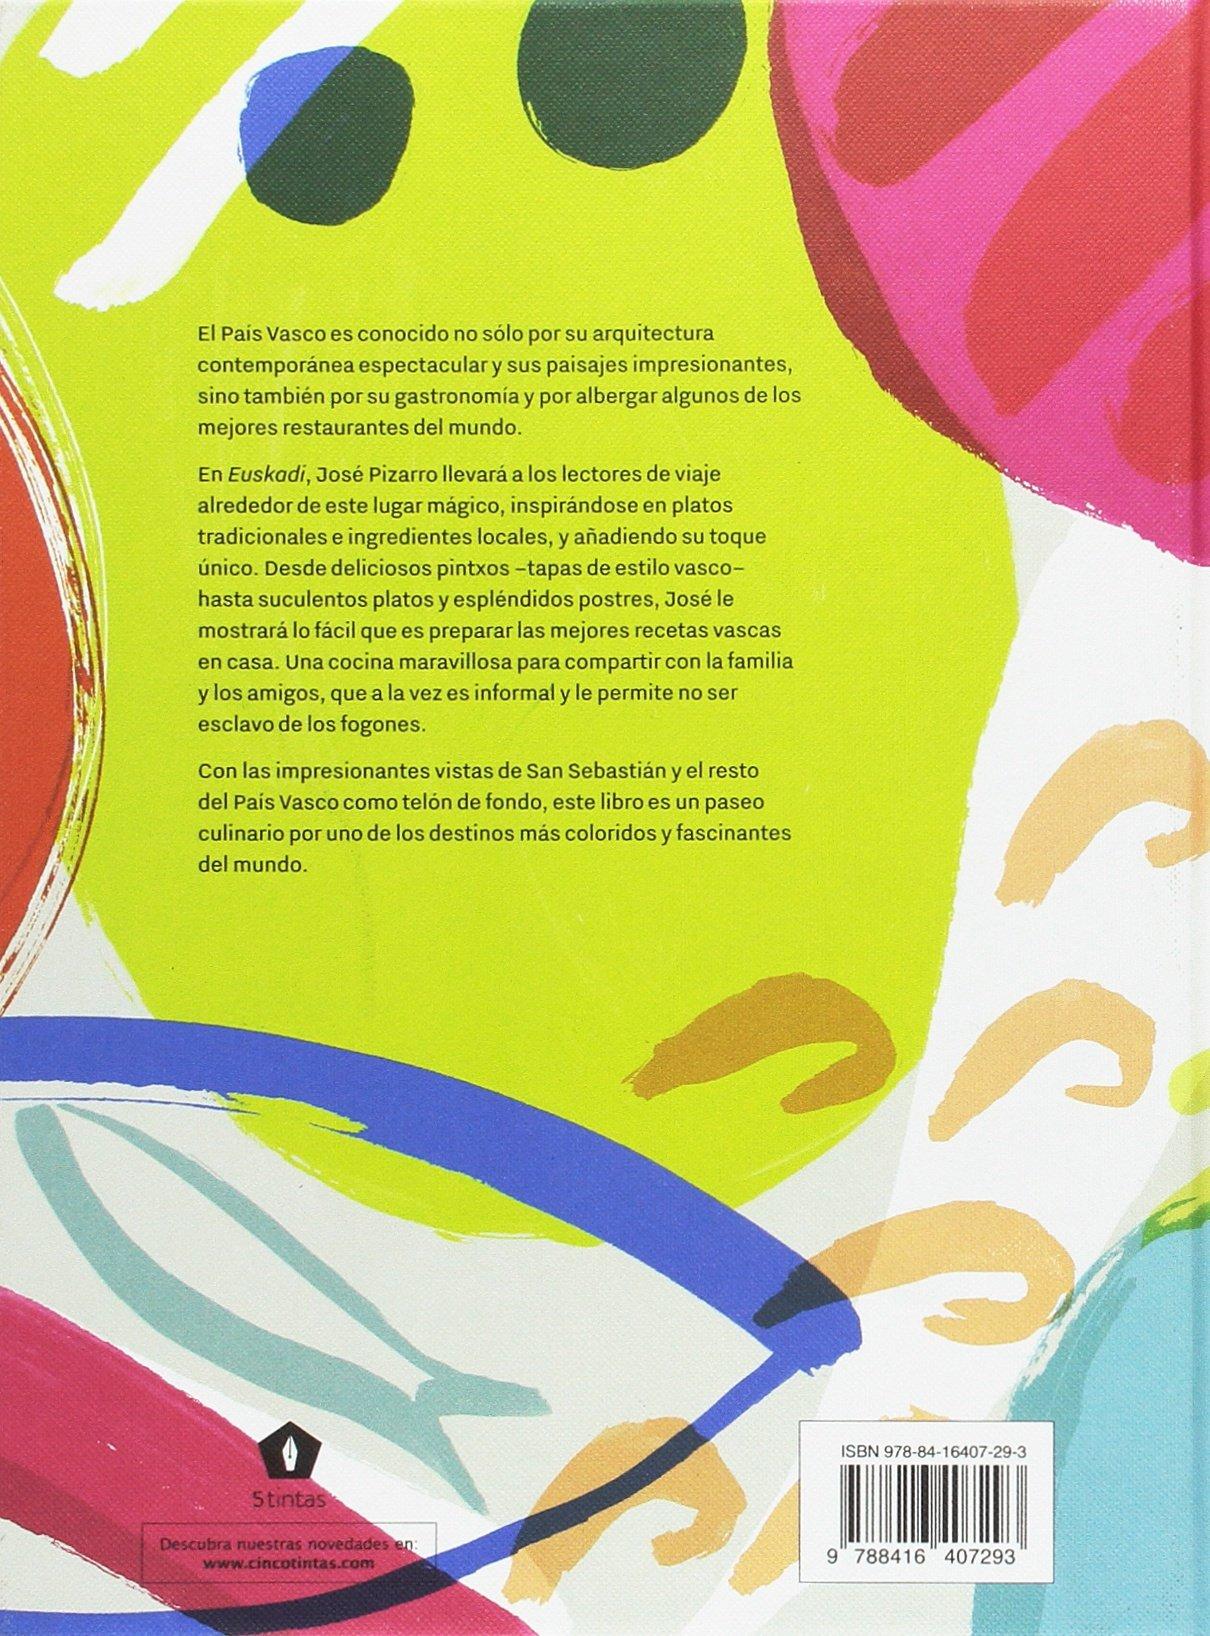 Euskadi (Spanish Edition): José Pizarro: 9788416407293: Amazon.com: Books